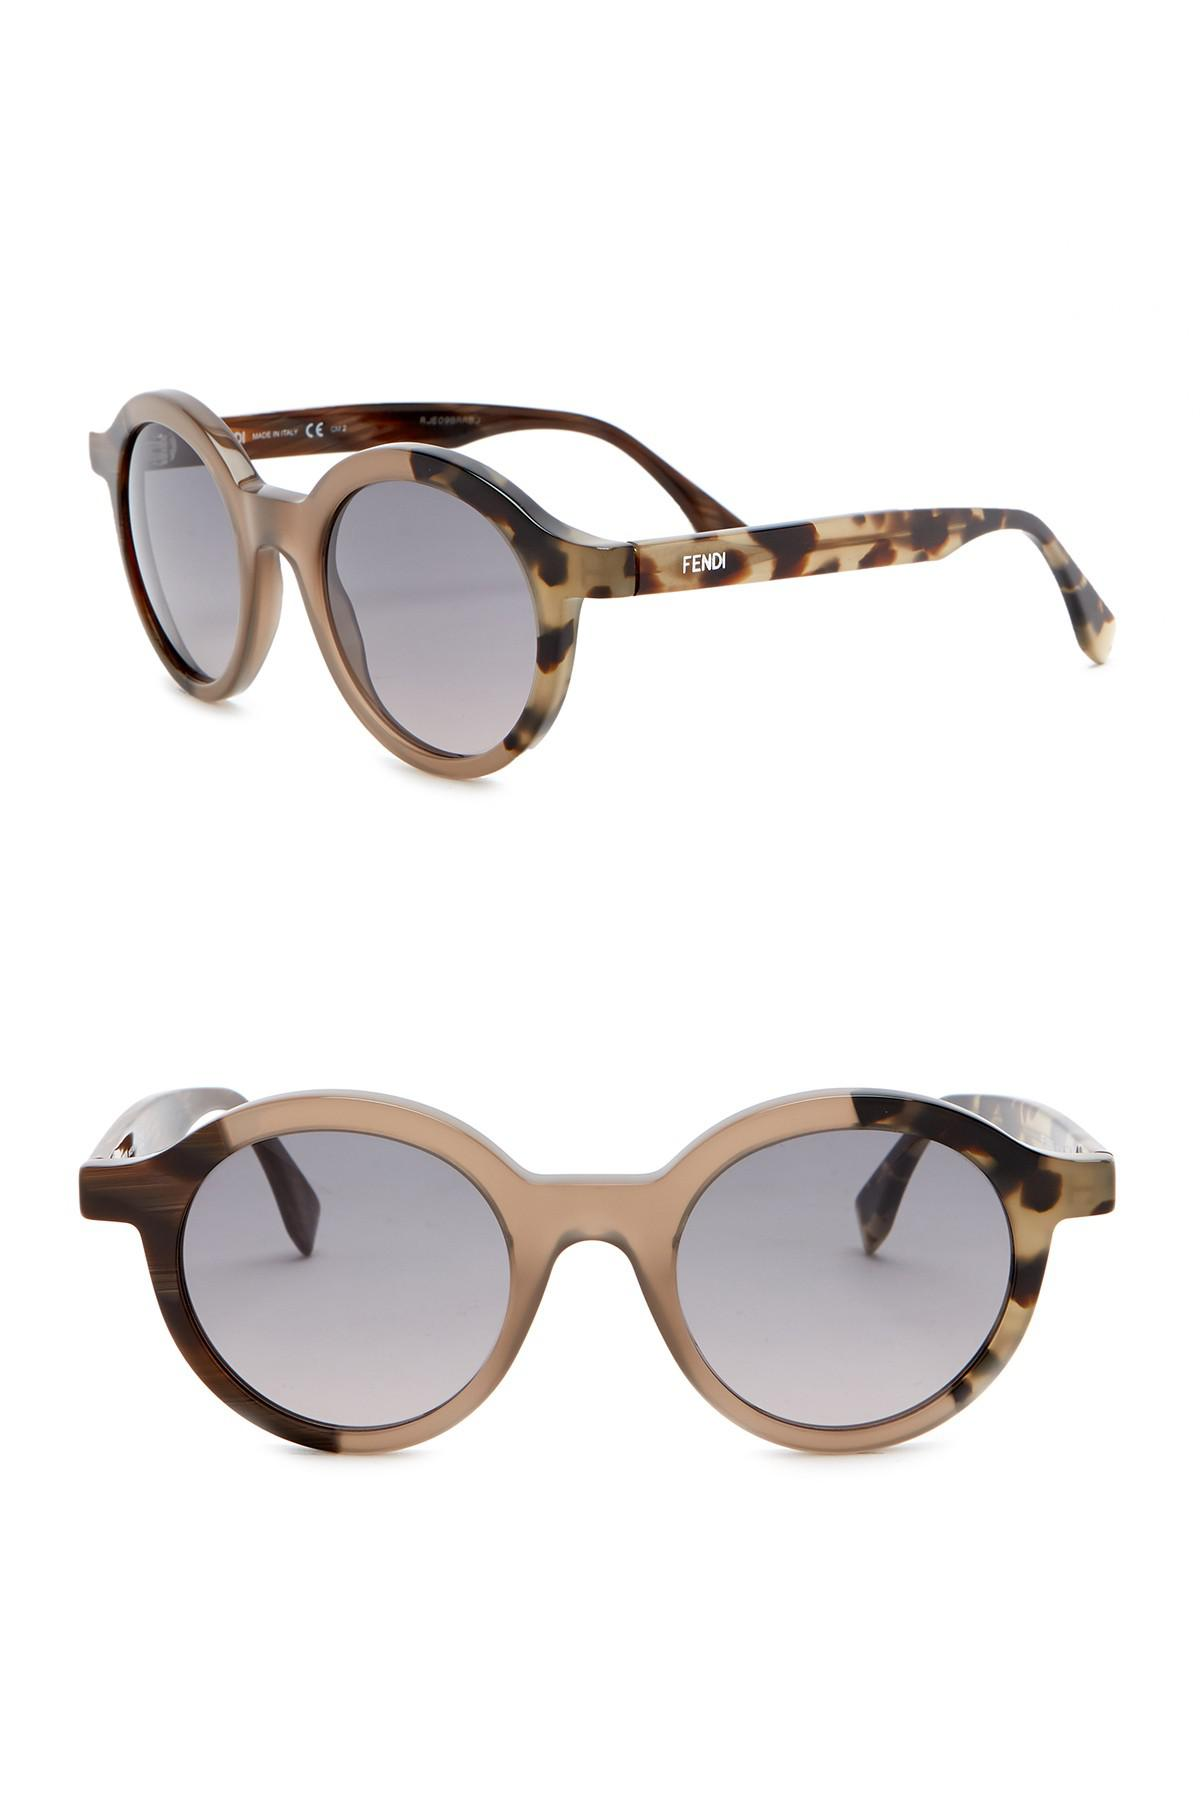 b4a110e5e5ec Lyst - Fendi Women s 48mm Round Sunglasses